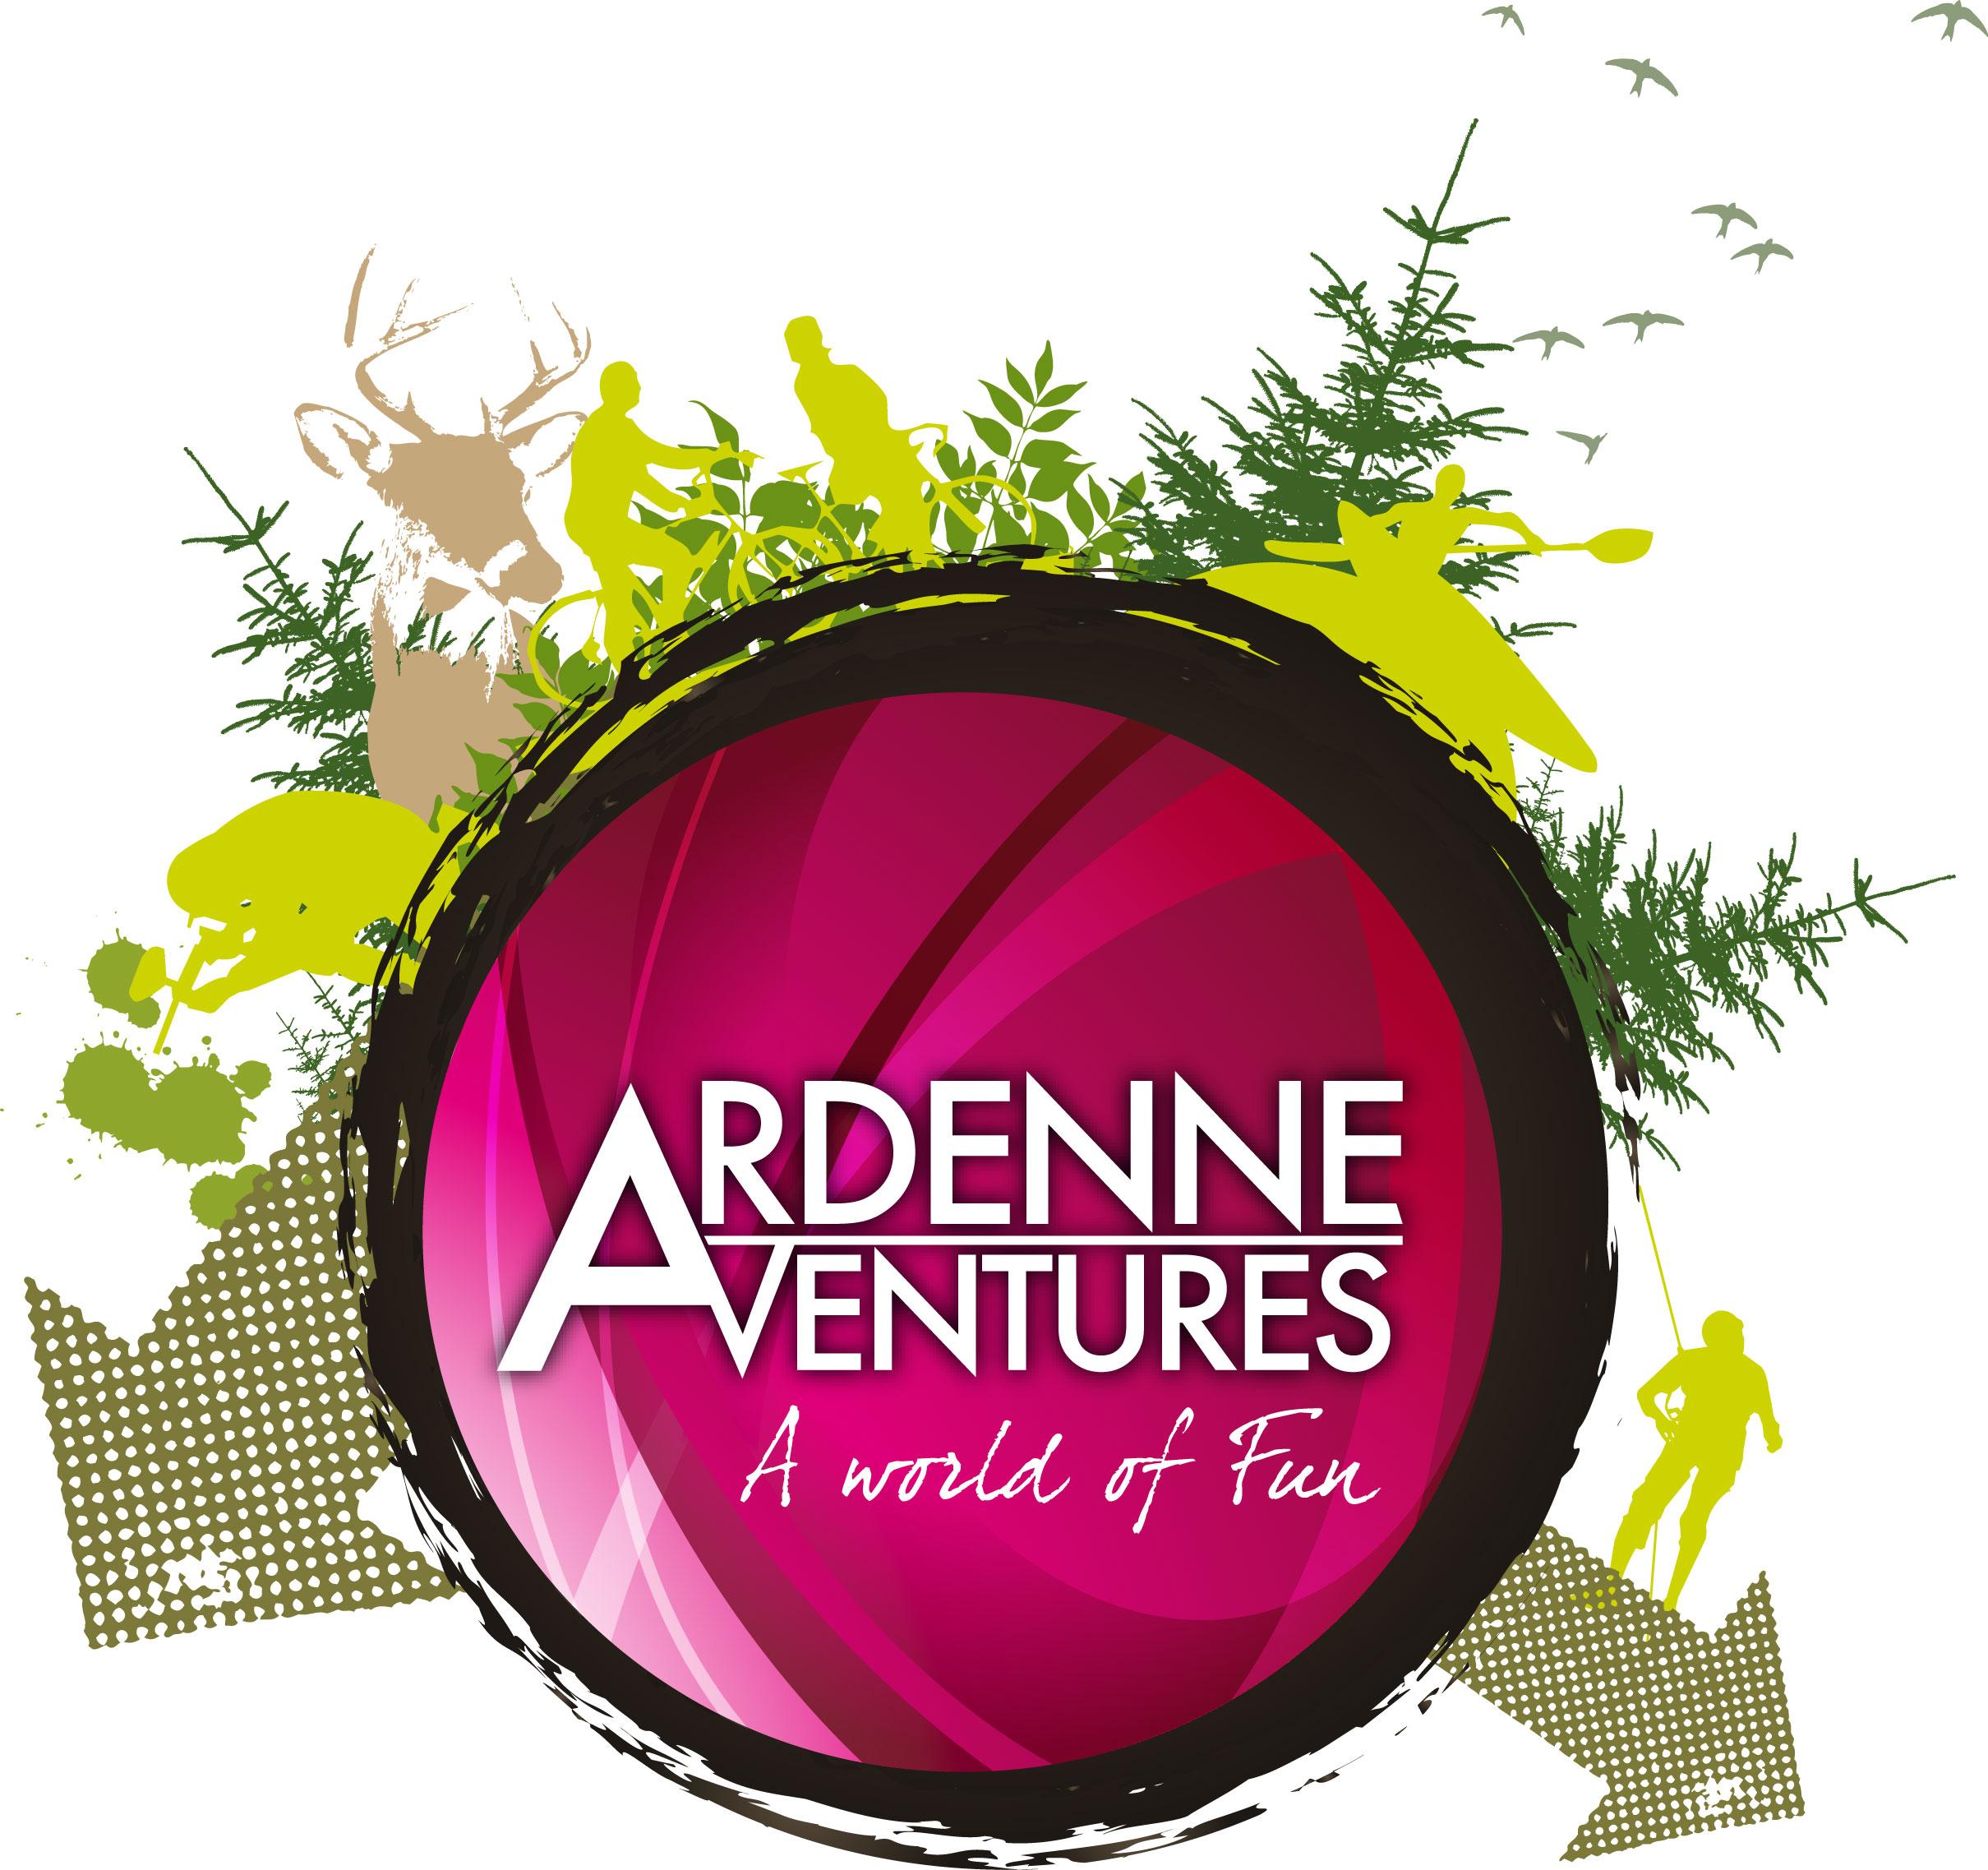 Ardenne Aventures - Descente de l'Ourthe